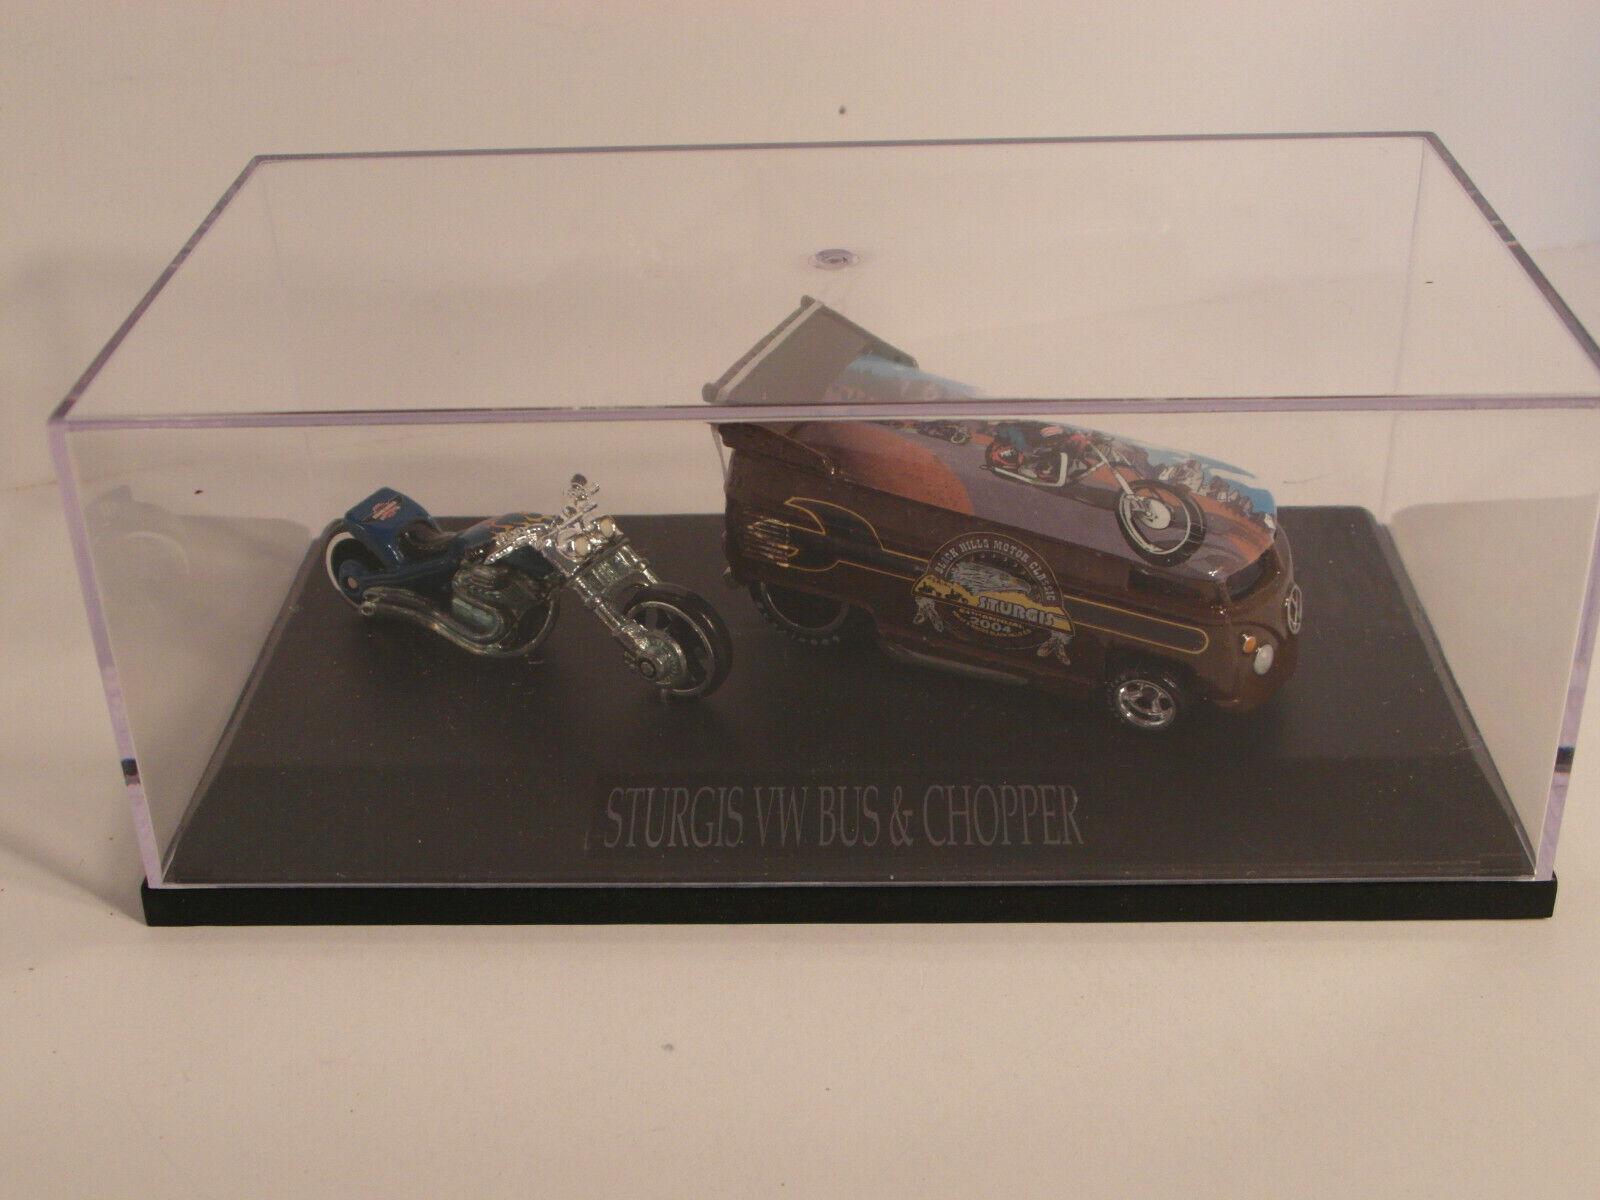 2004 HW LIBERTY Promotion STURGIS VW DRAG BUS  Set hommeS Edition  1139 1300  grande remise